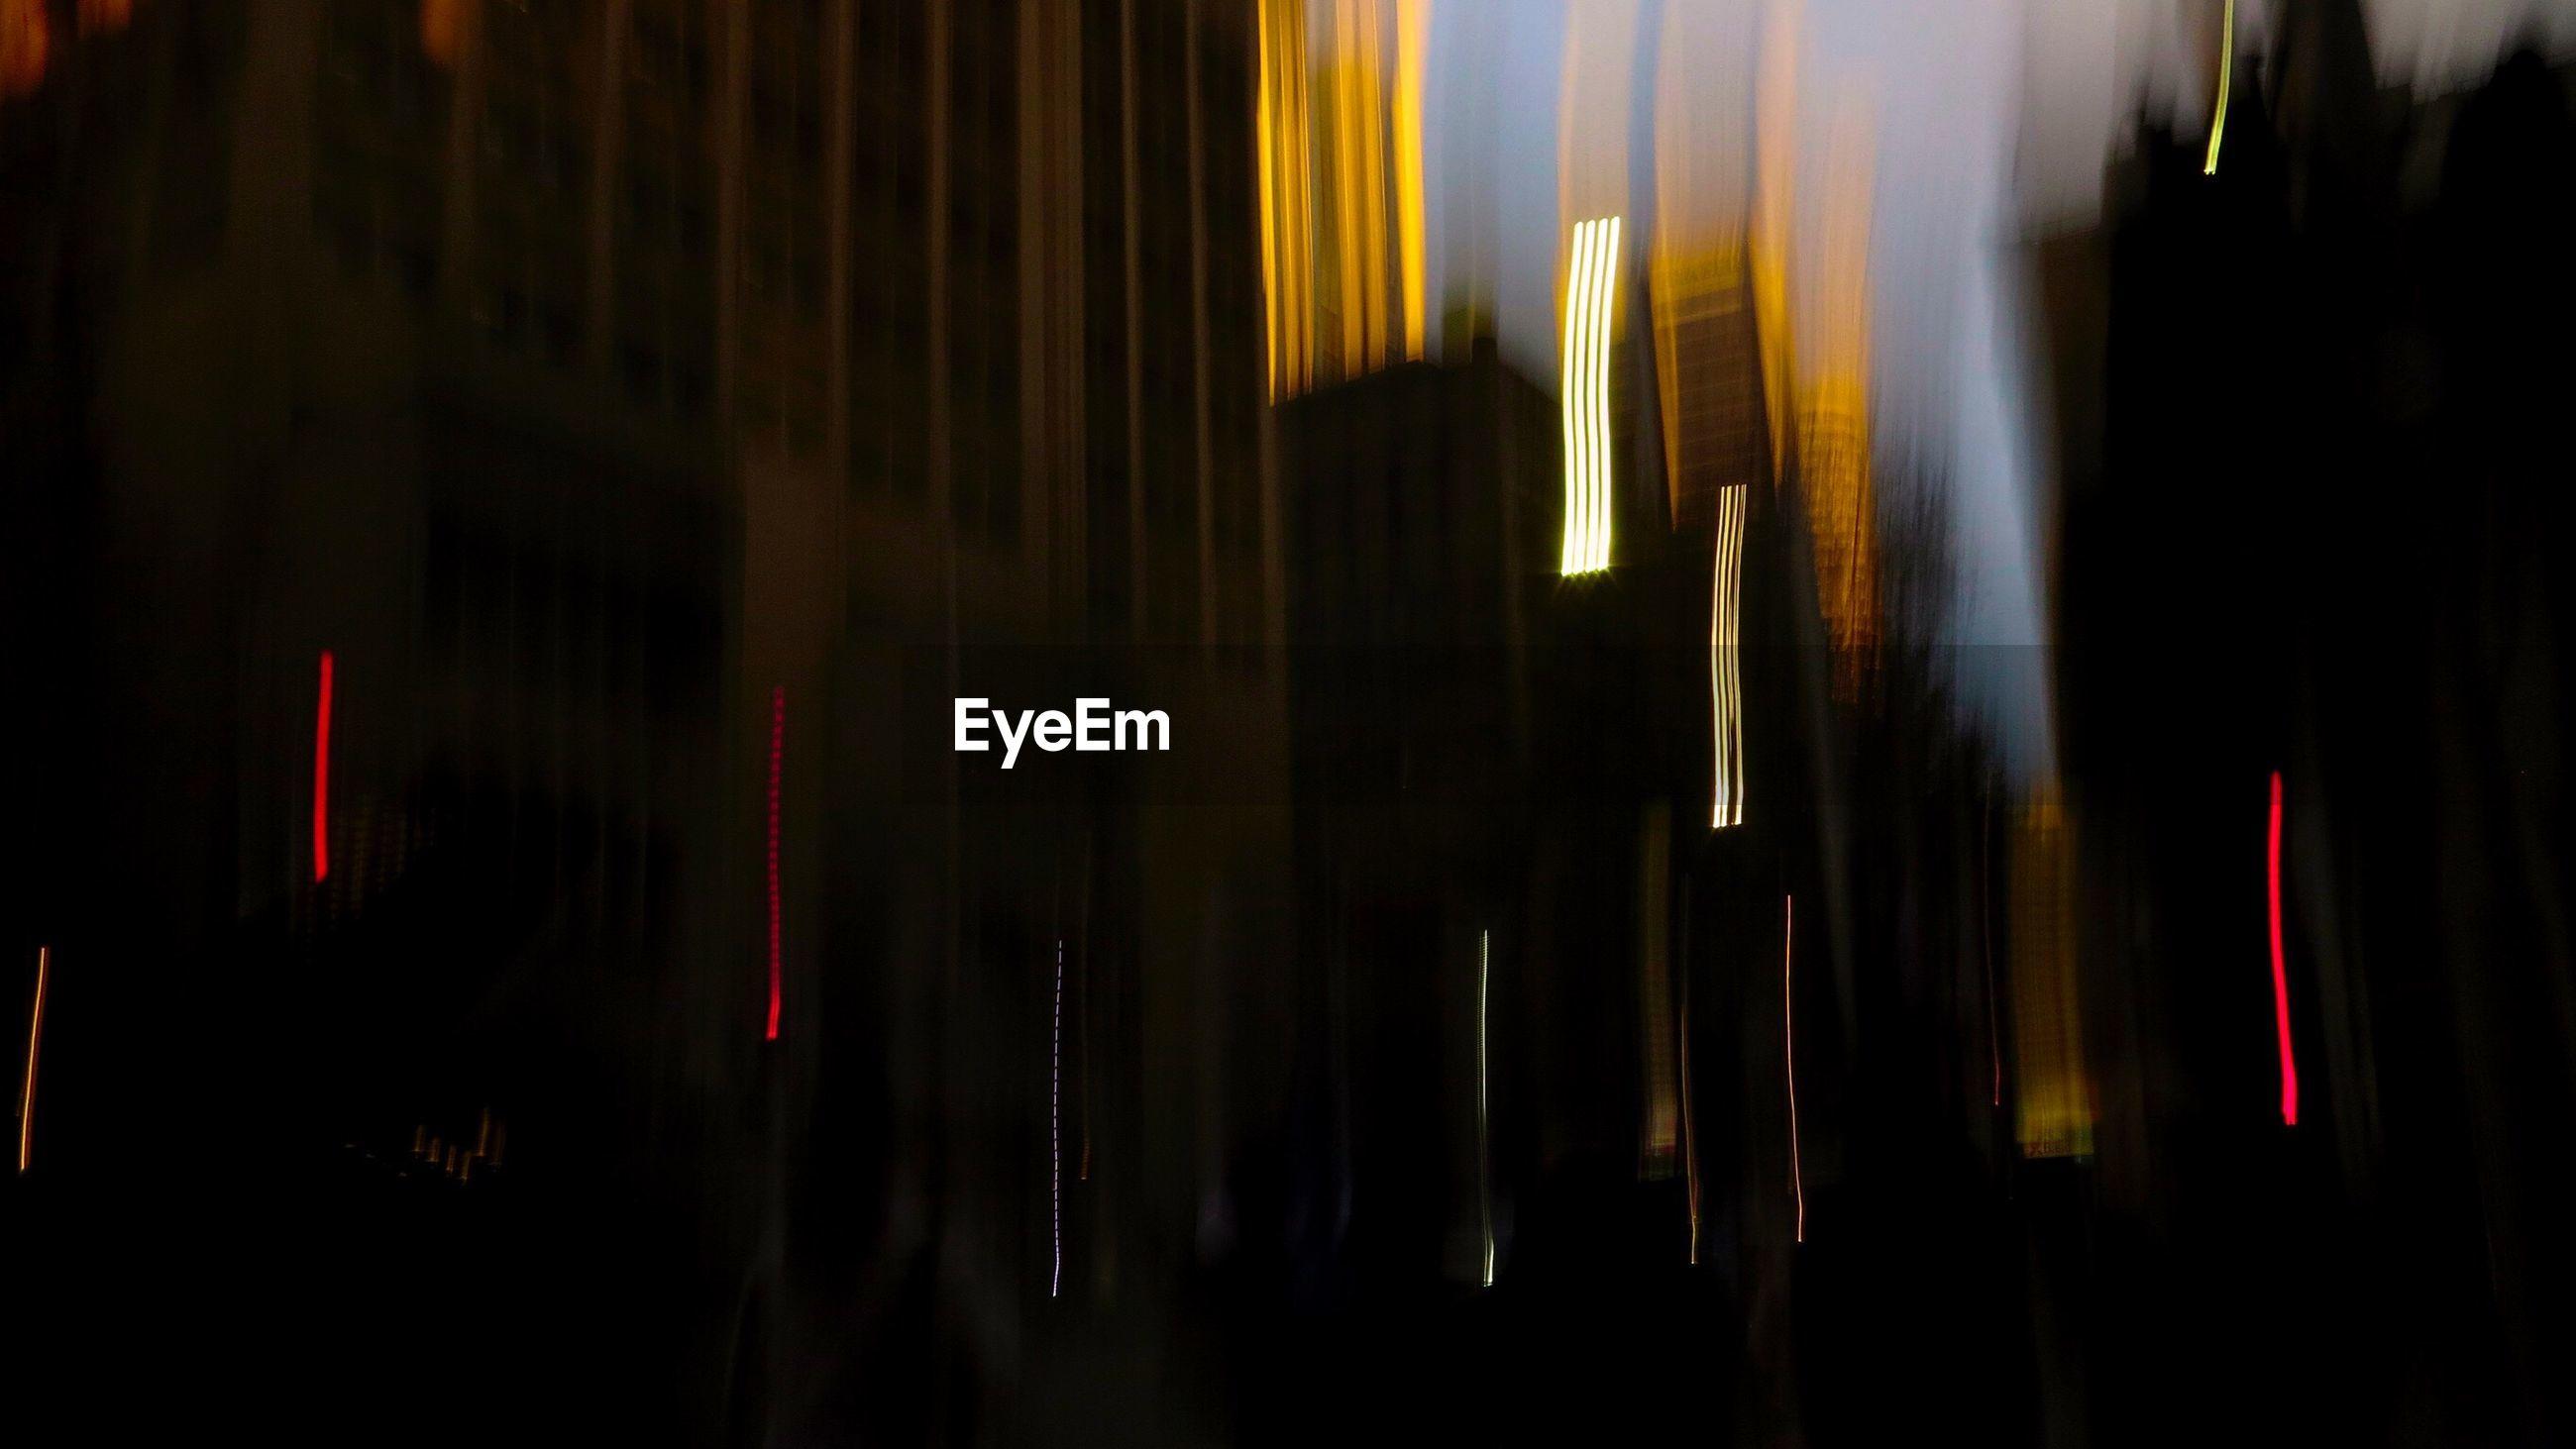 no people, architecture, illuminated, religion, built structure, panoramic, indoors, building exterior, city, night